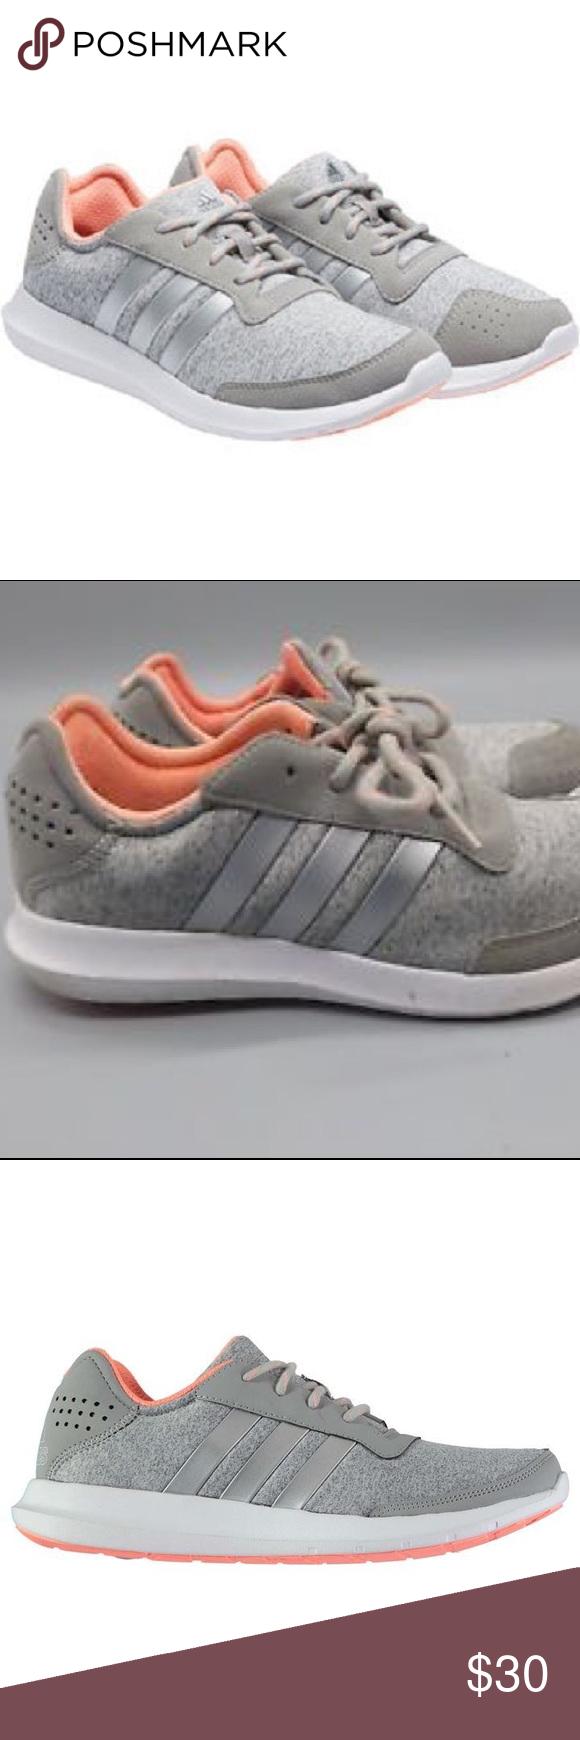 Adidas Supercloud Running Shoes Grey